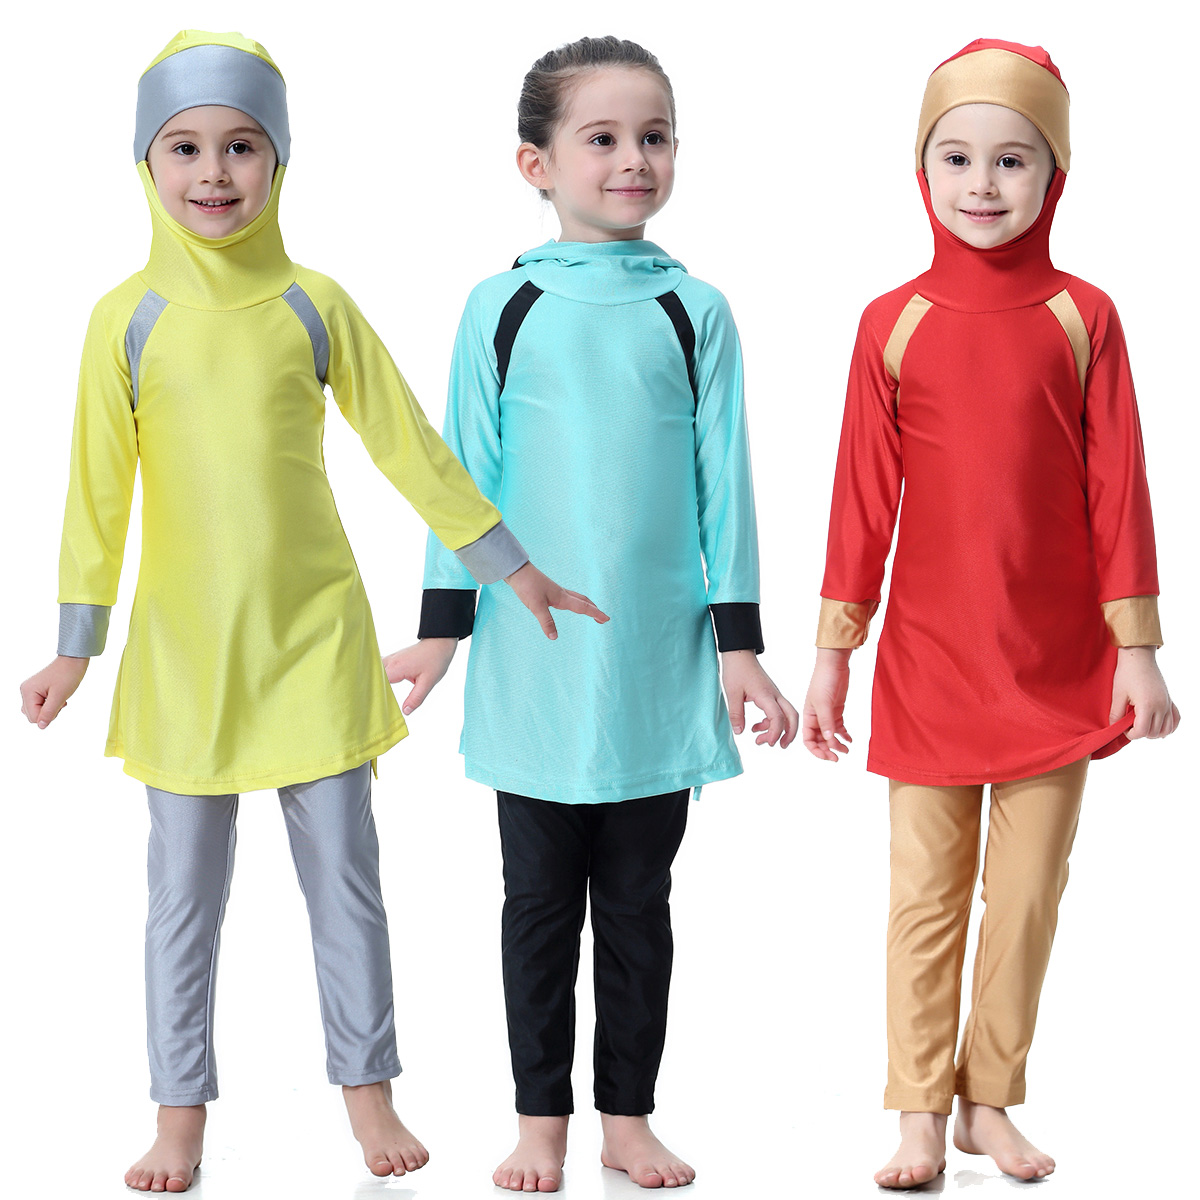 Muslim Kids Girls Burkini Swimsuit Modest Islamic Beachwear Bathing Suit Sets